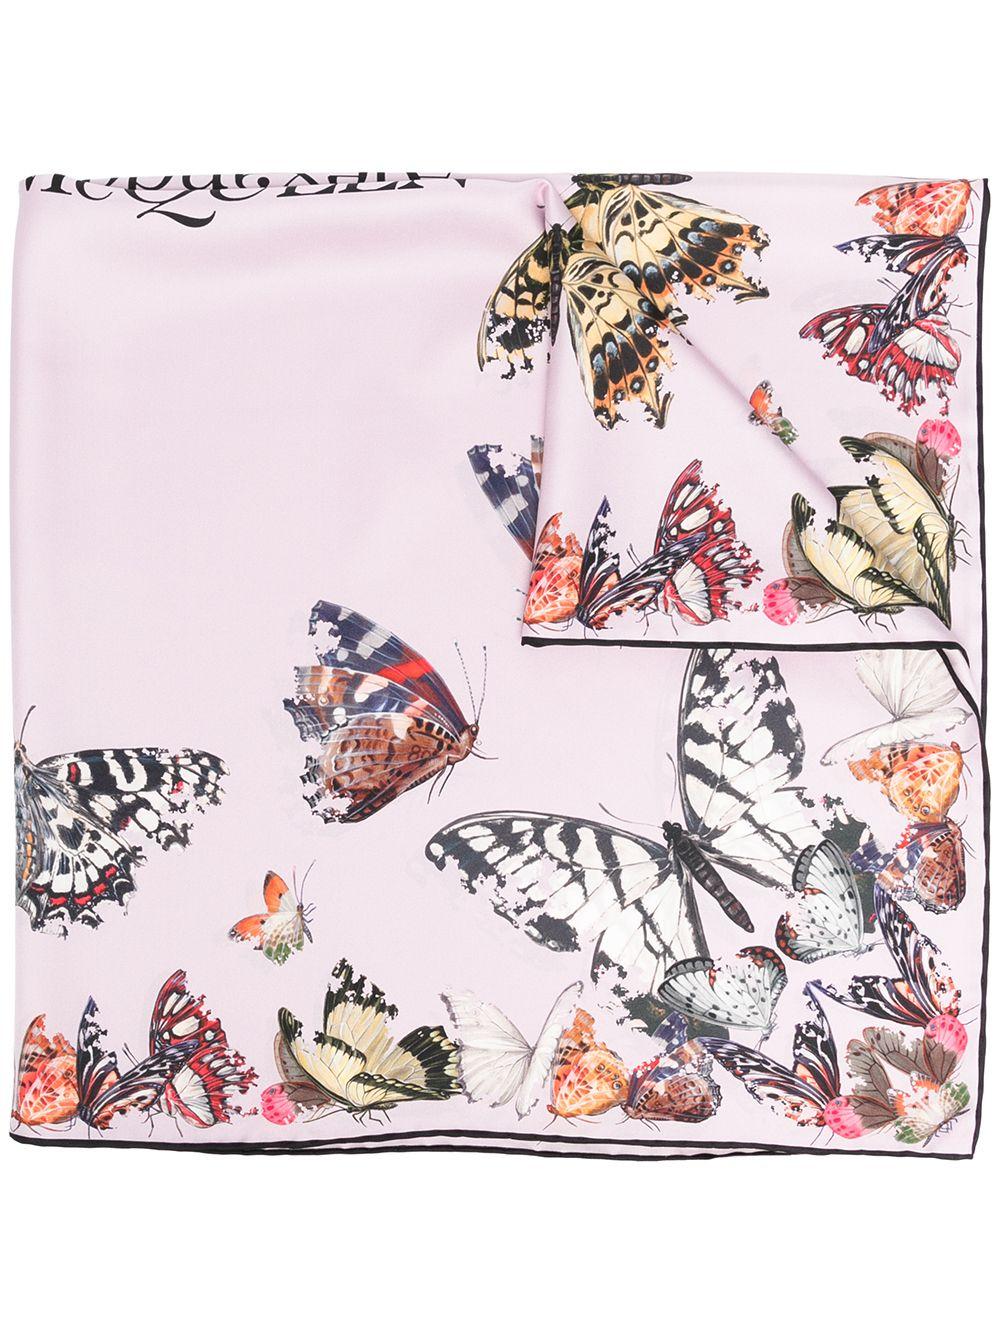 alexander mcqueen silk butterfly decay scarf